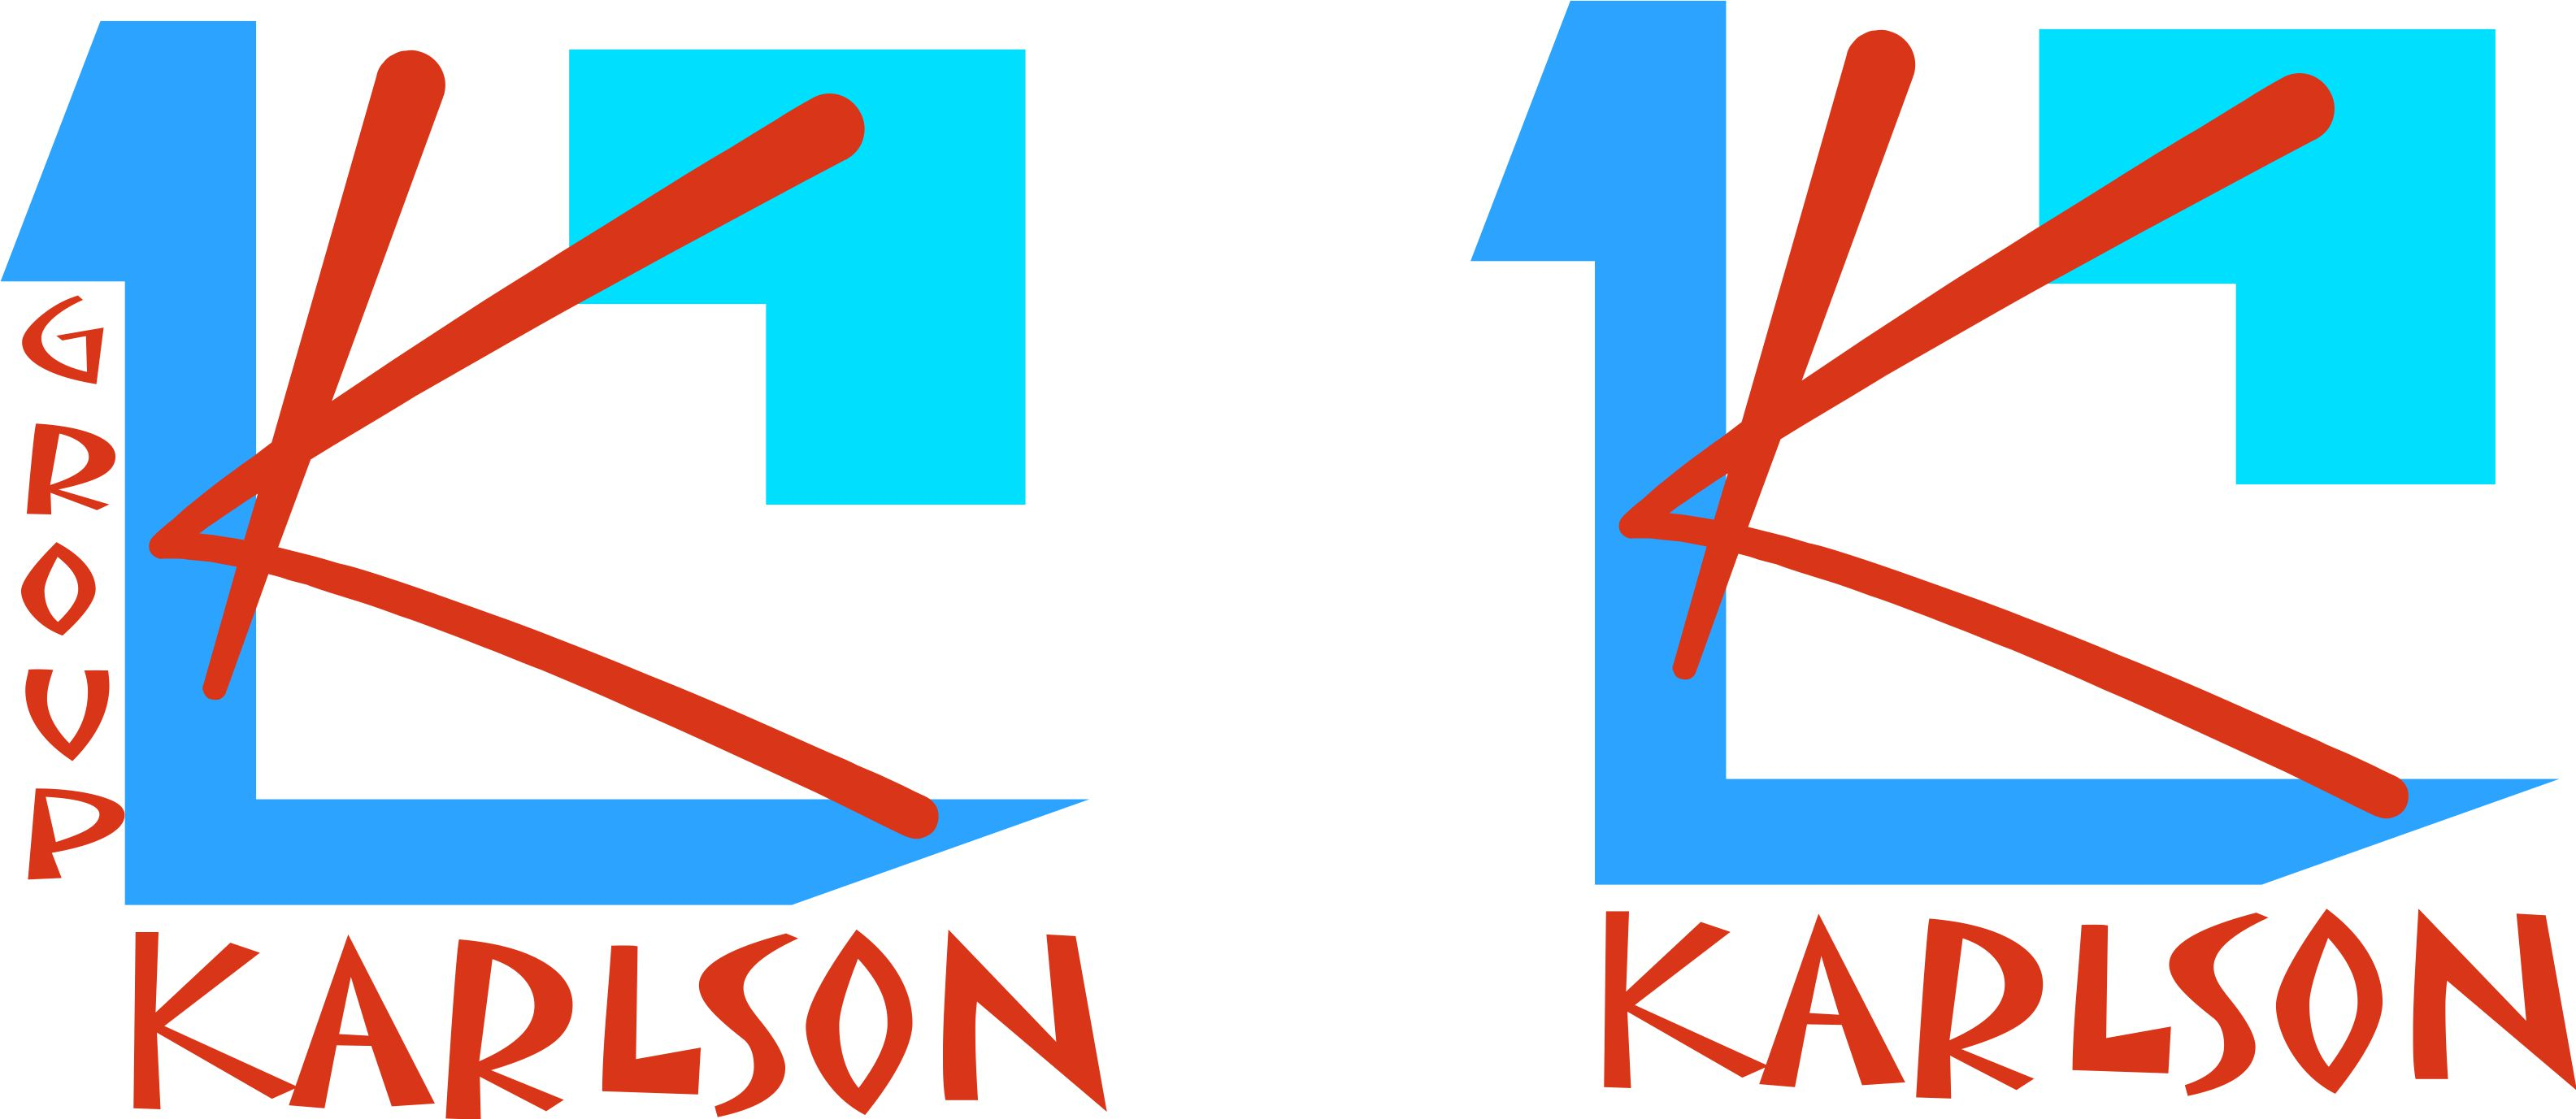 Придумать классный логотип фото f_241598a0b45a27b2.jpg